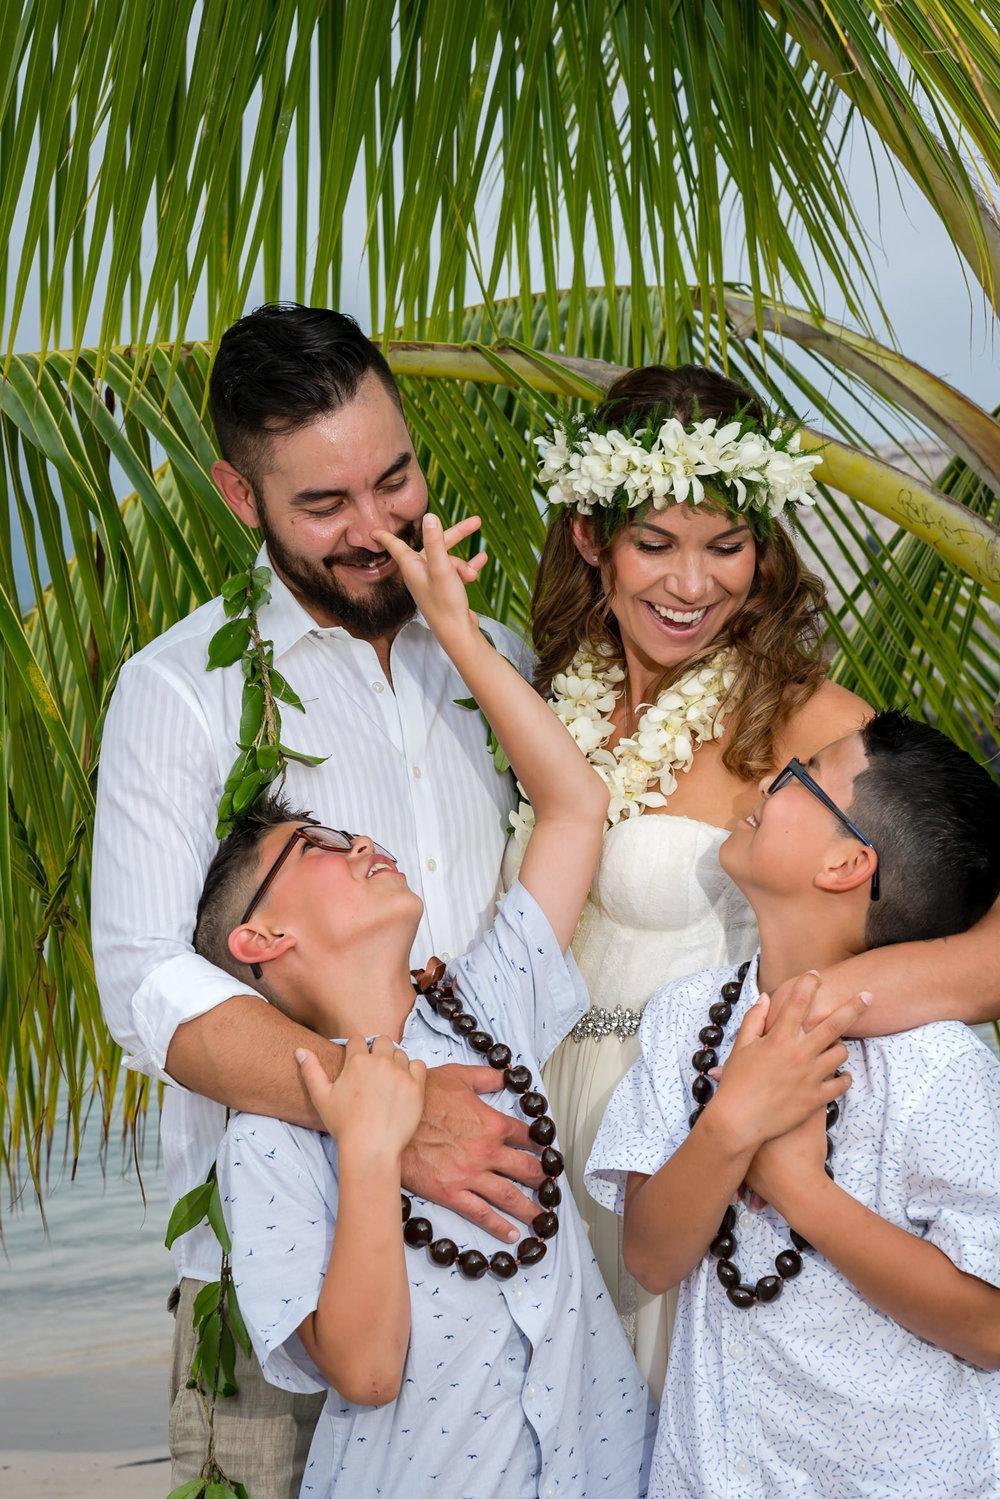 King Kamehmeha Beach Hotel Marriott Kailua-Kona Hawaii Beach Wed